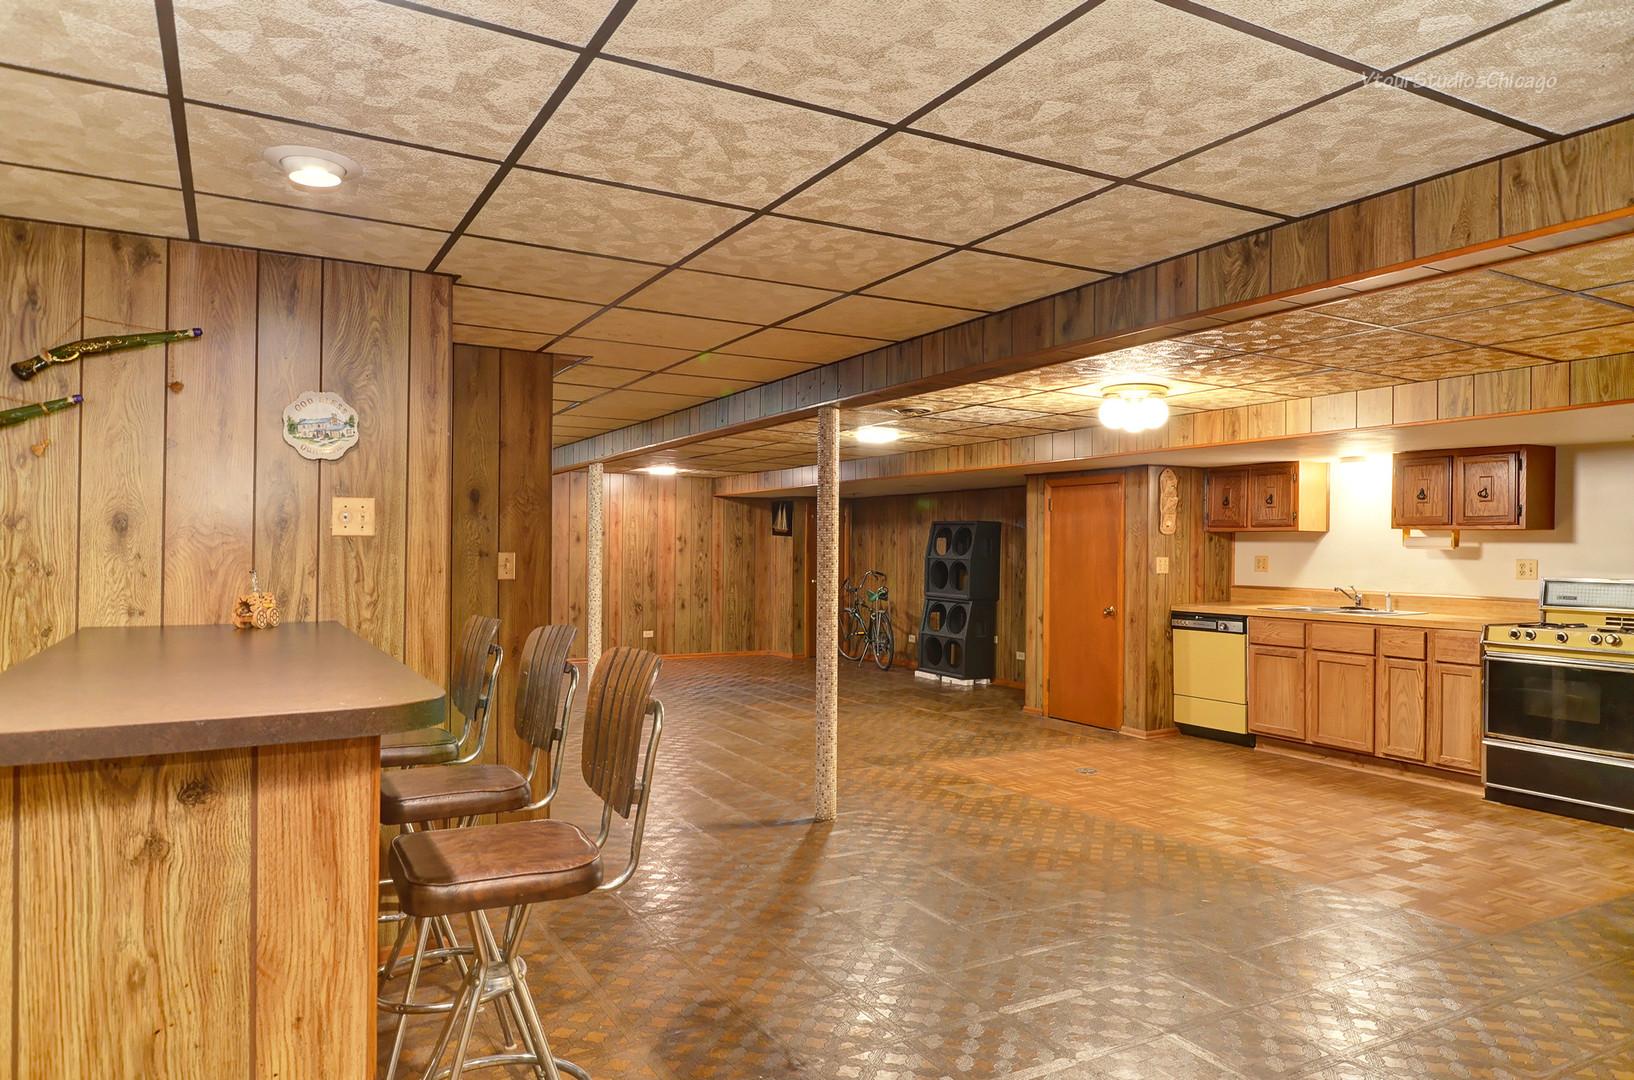 3757 Scott, Schiller Park, Illinois, 60176